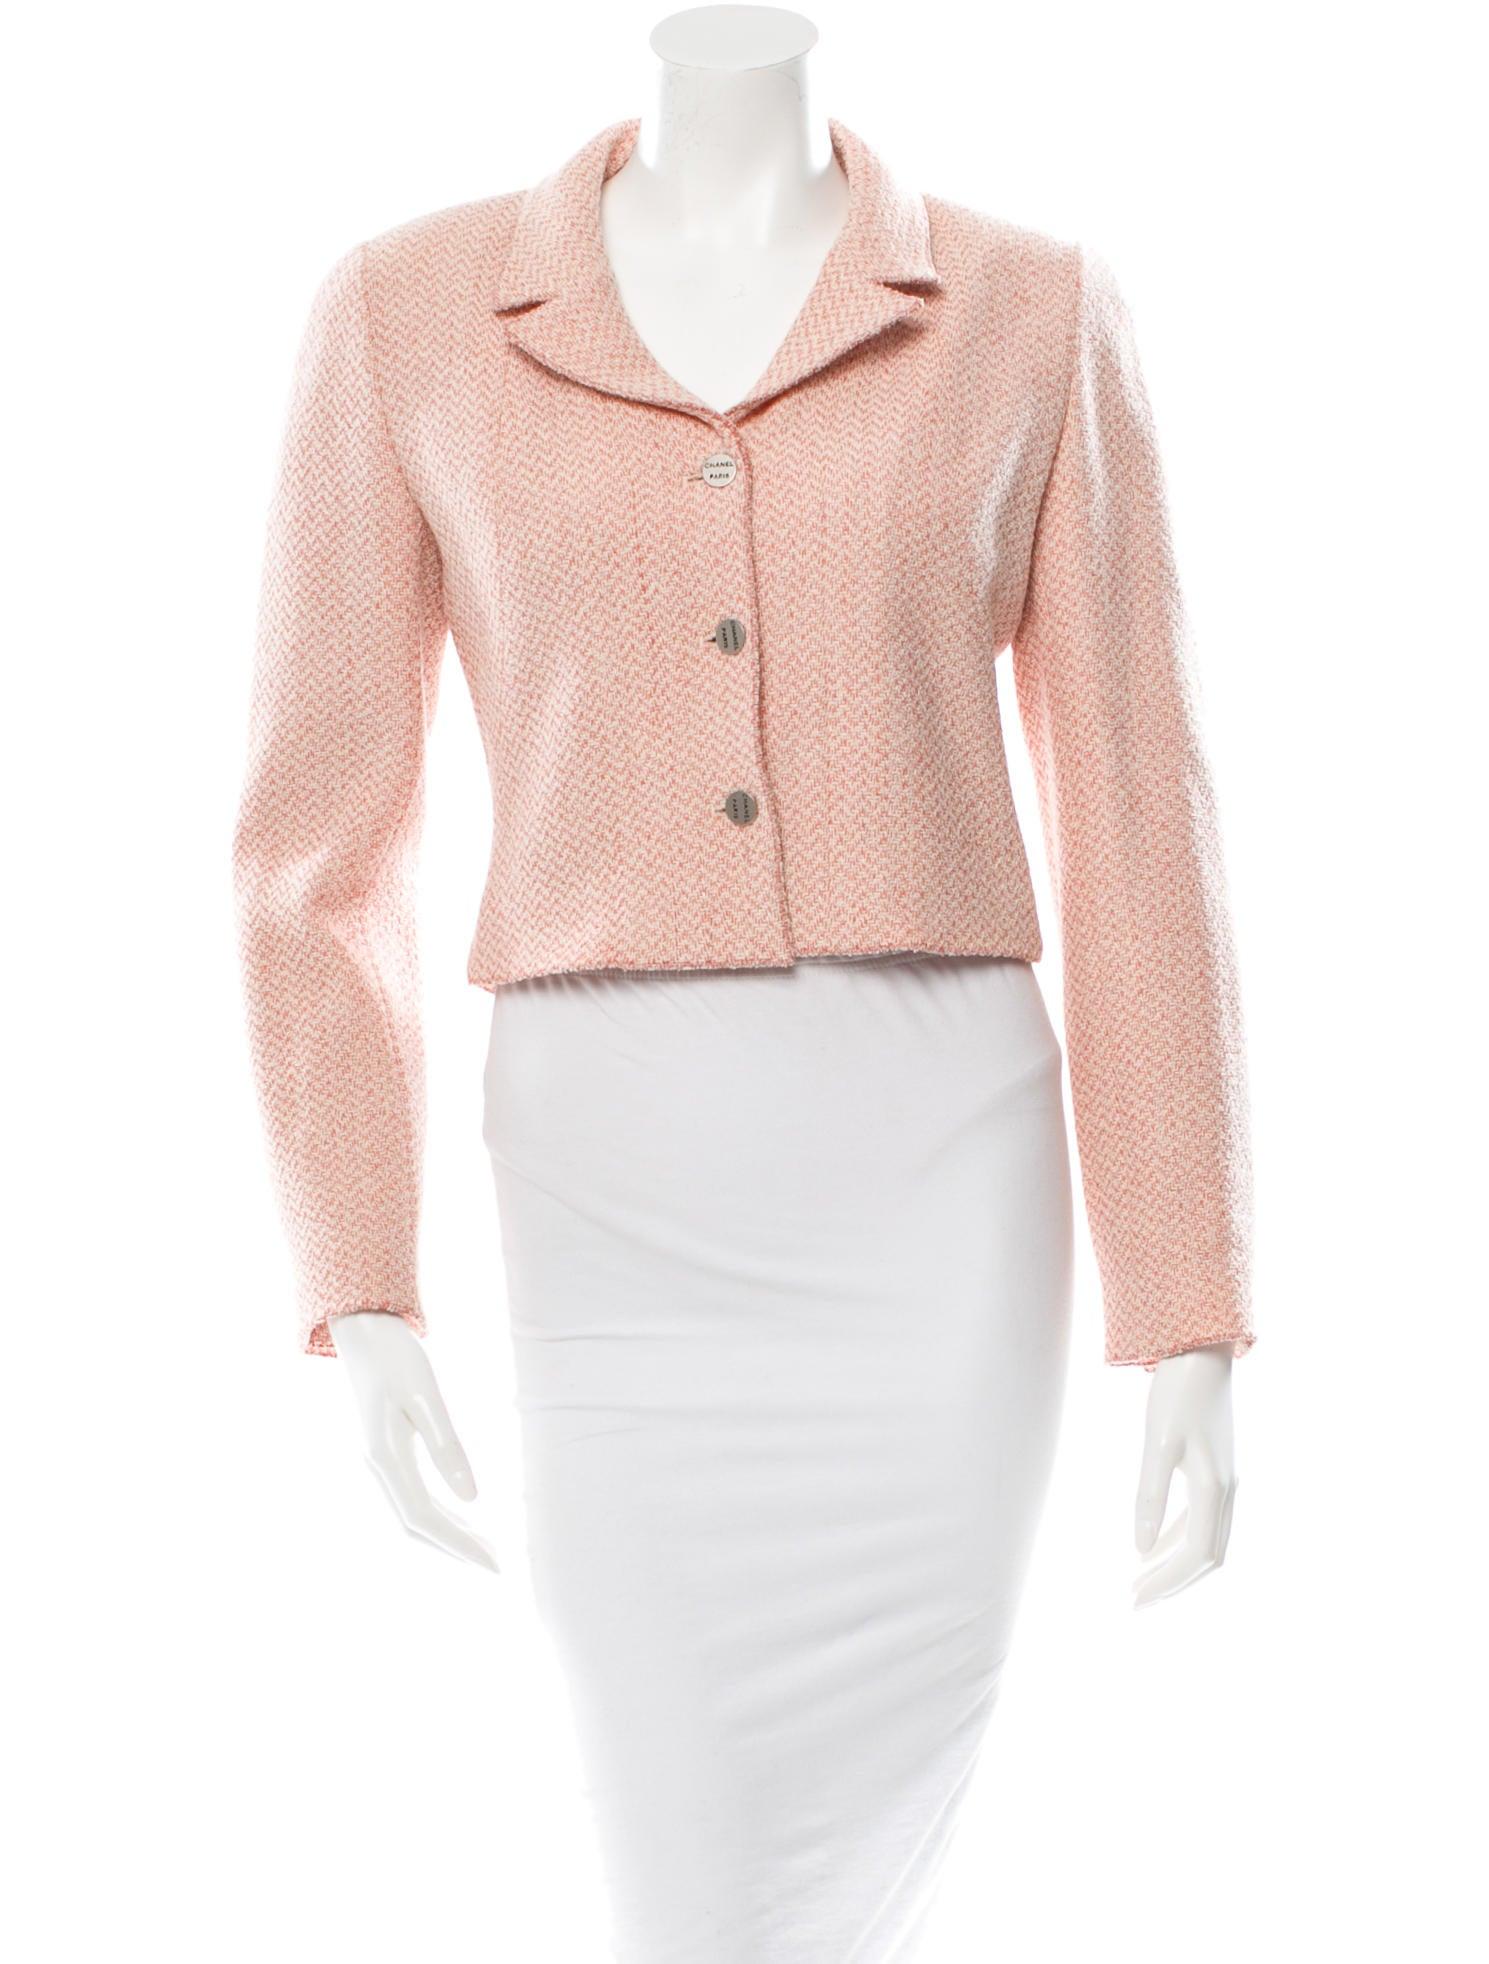 Denim Jacket Knitting Pattern : Chanel Pattern Knit Jacket - Clothing - CHA80312 The RealReal